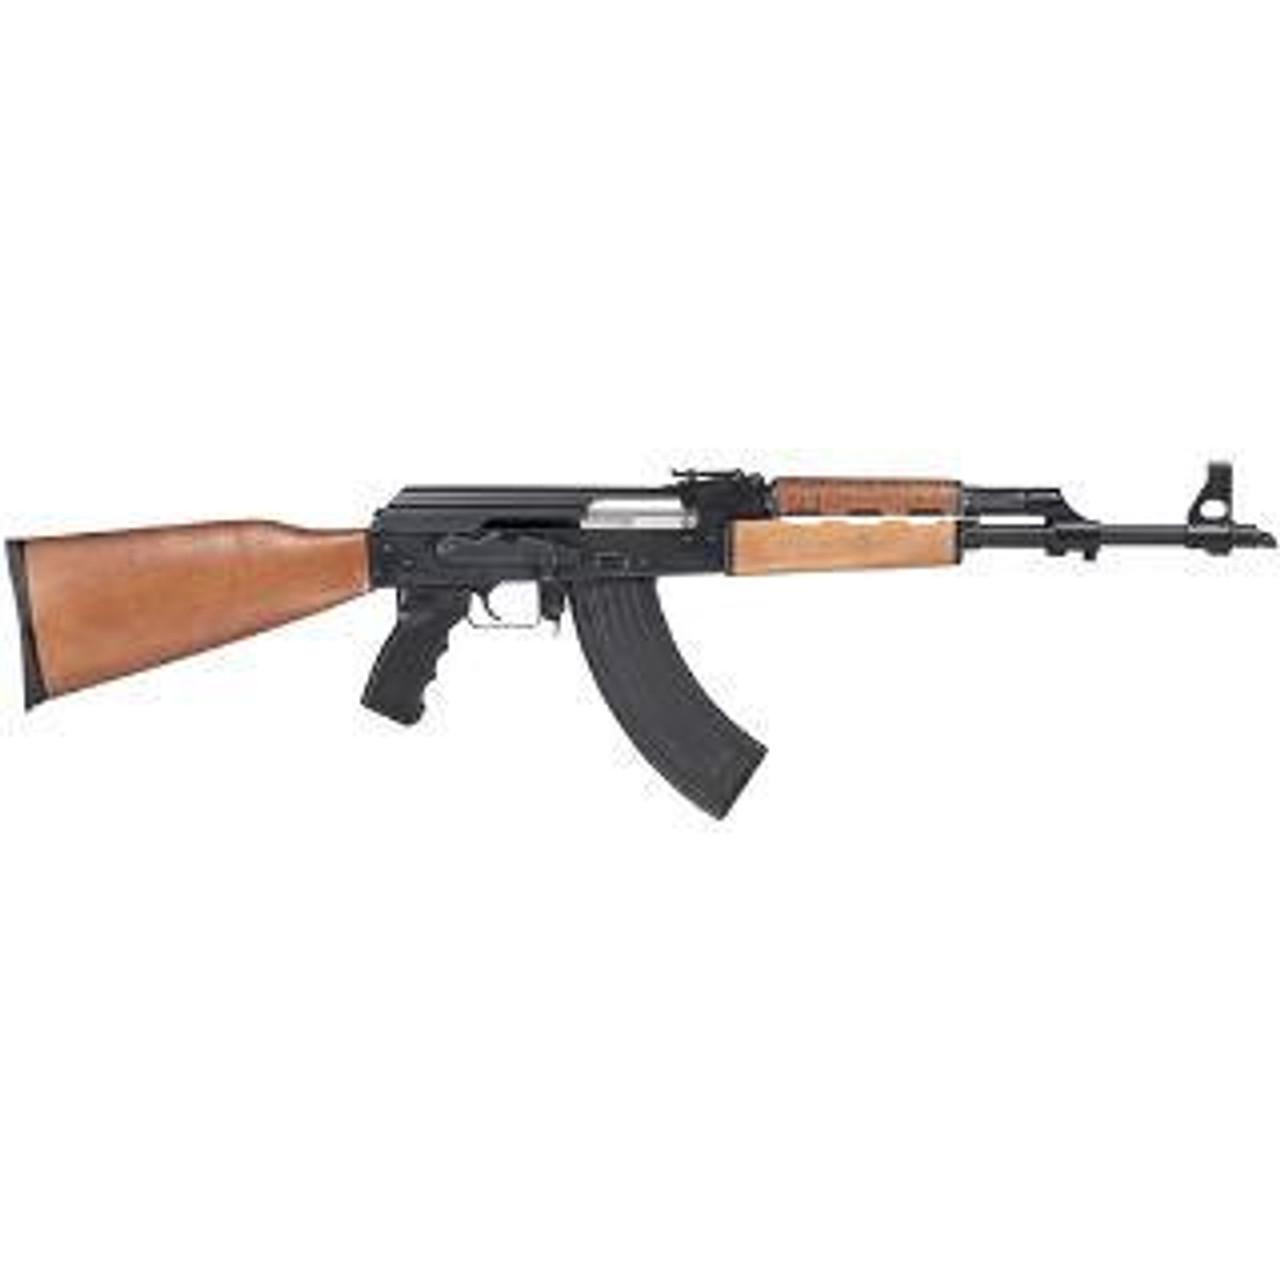 CENT ZASTAVA NPAP  AK47 CALIFORNIA LEGAL 7.62x39